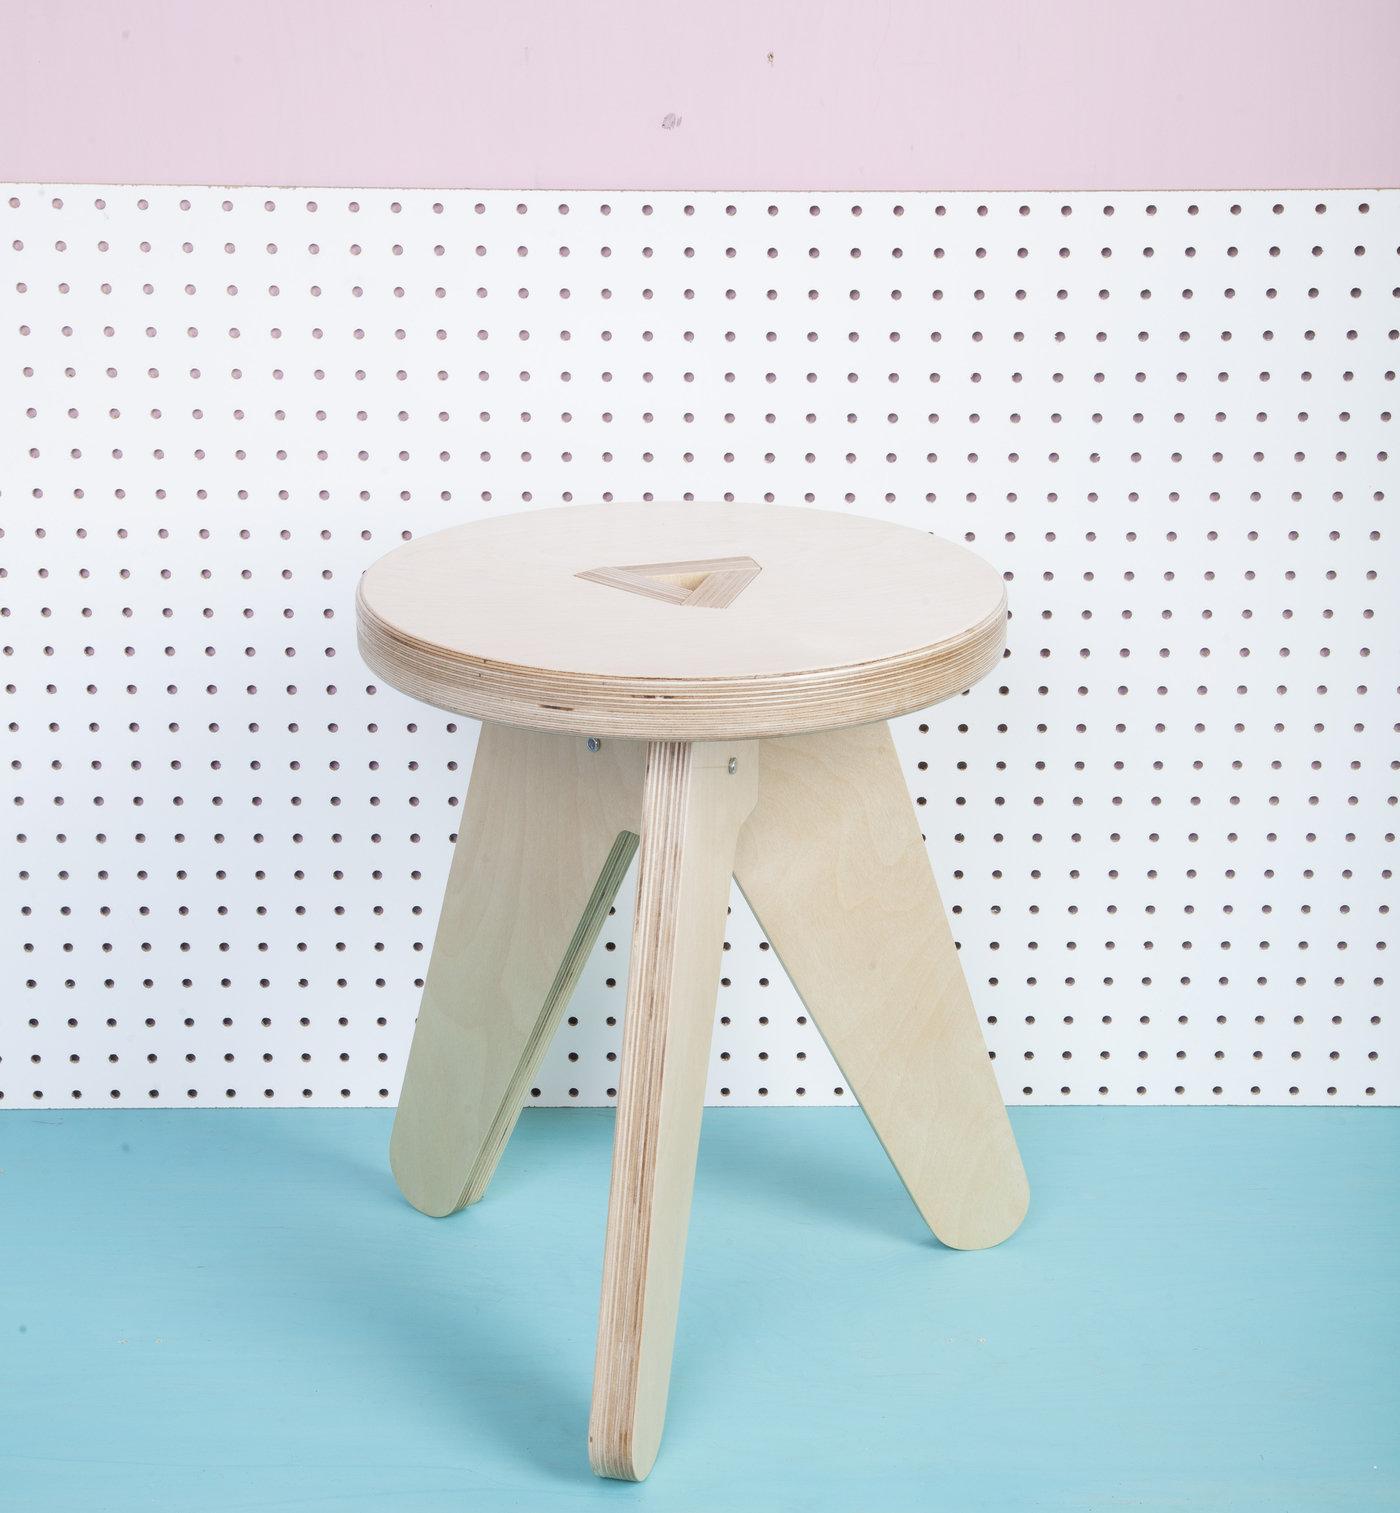 Phenomenal Flat Pack Stool By Andrew Raffel At Coroflot Com Theyellowbook Wood Chair Design Ideas Theyellowbookinfo